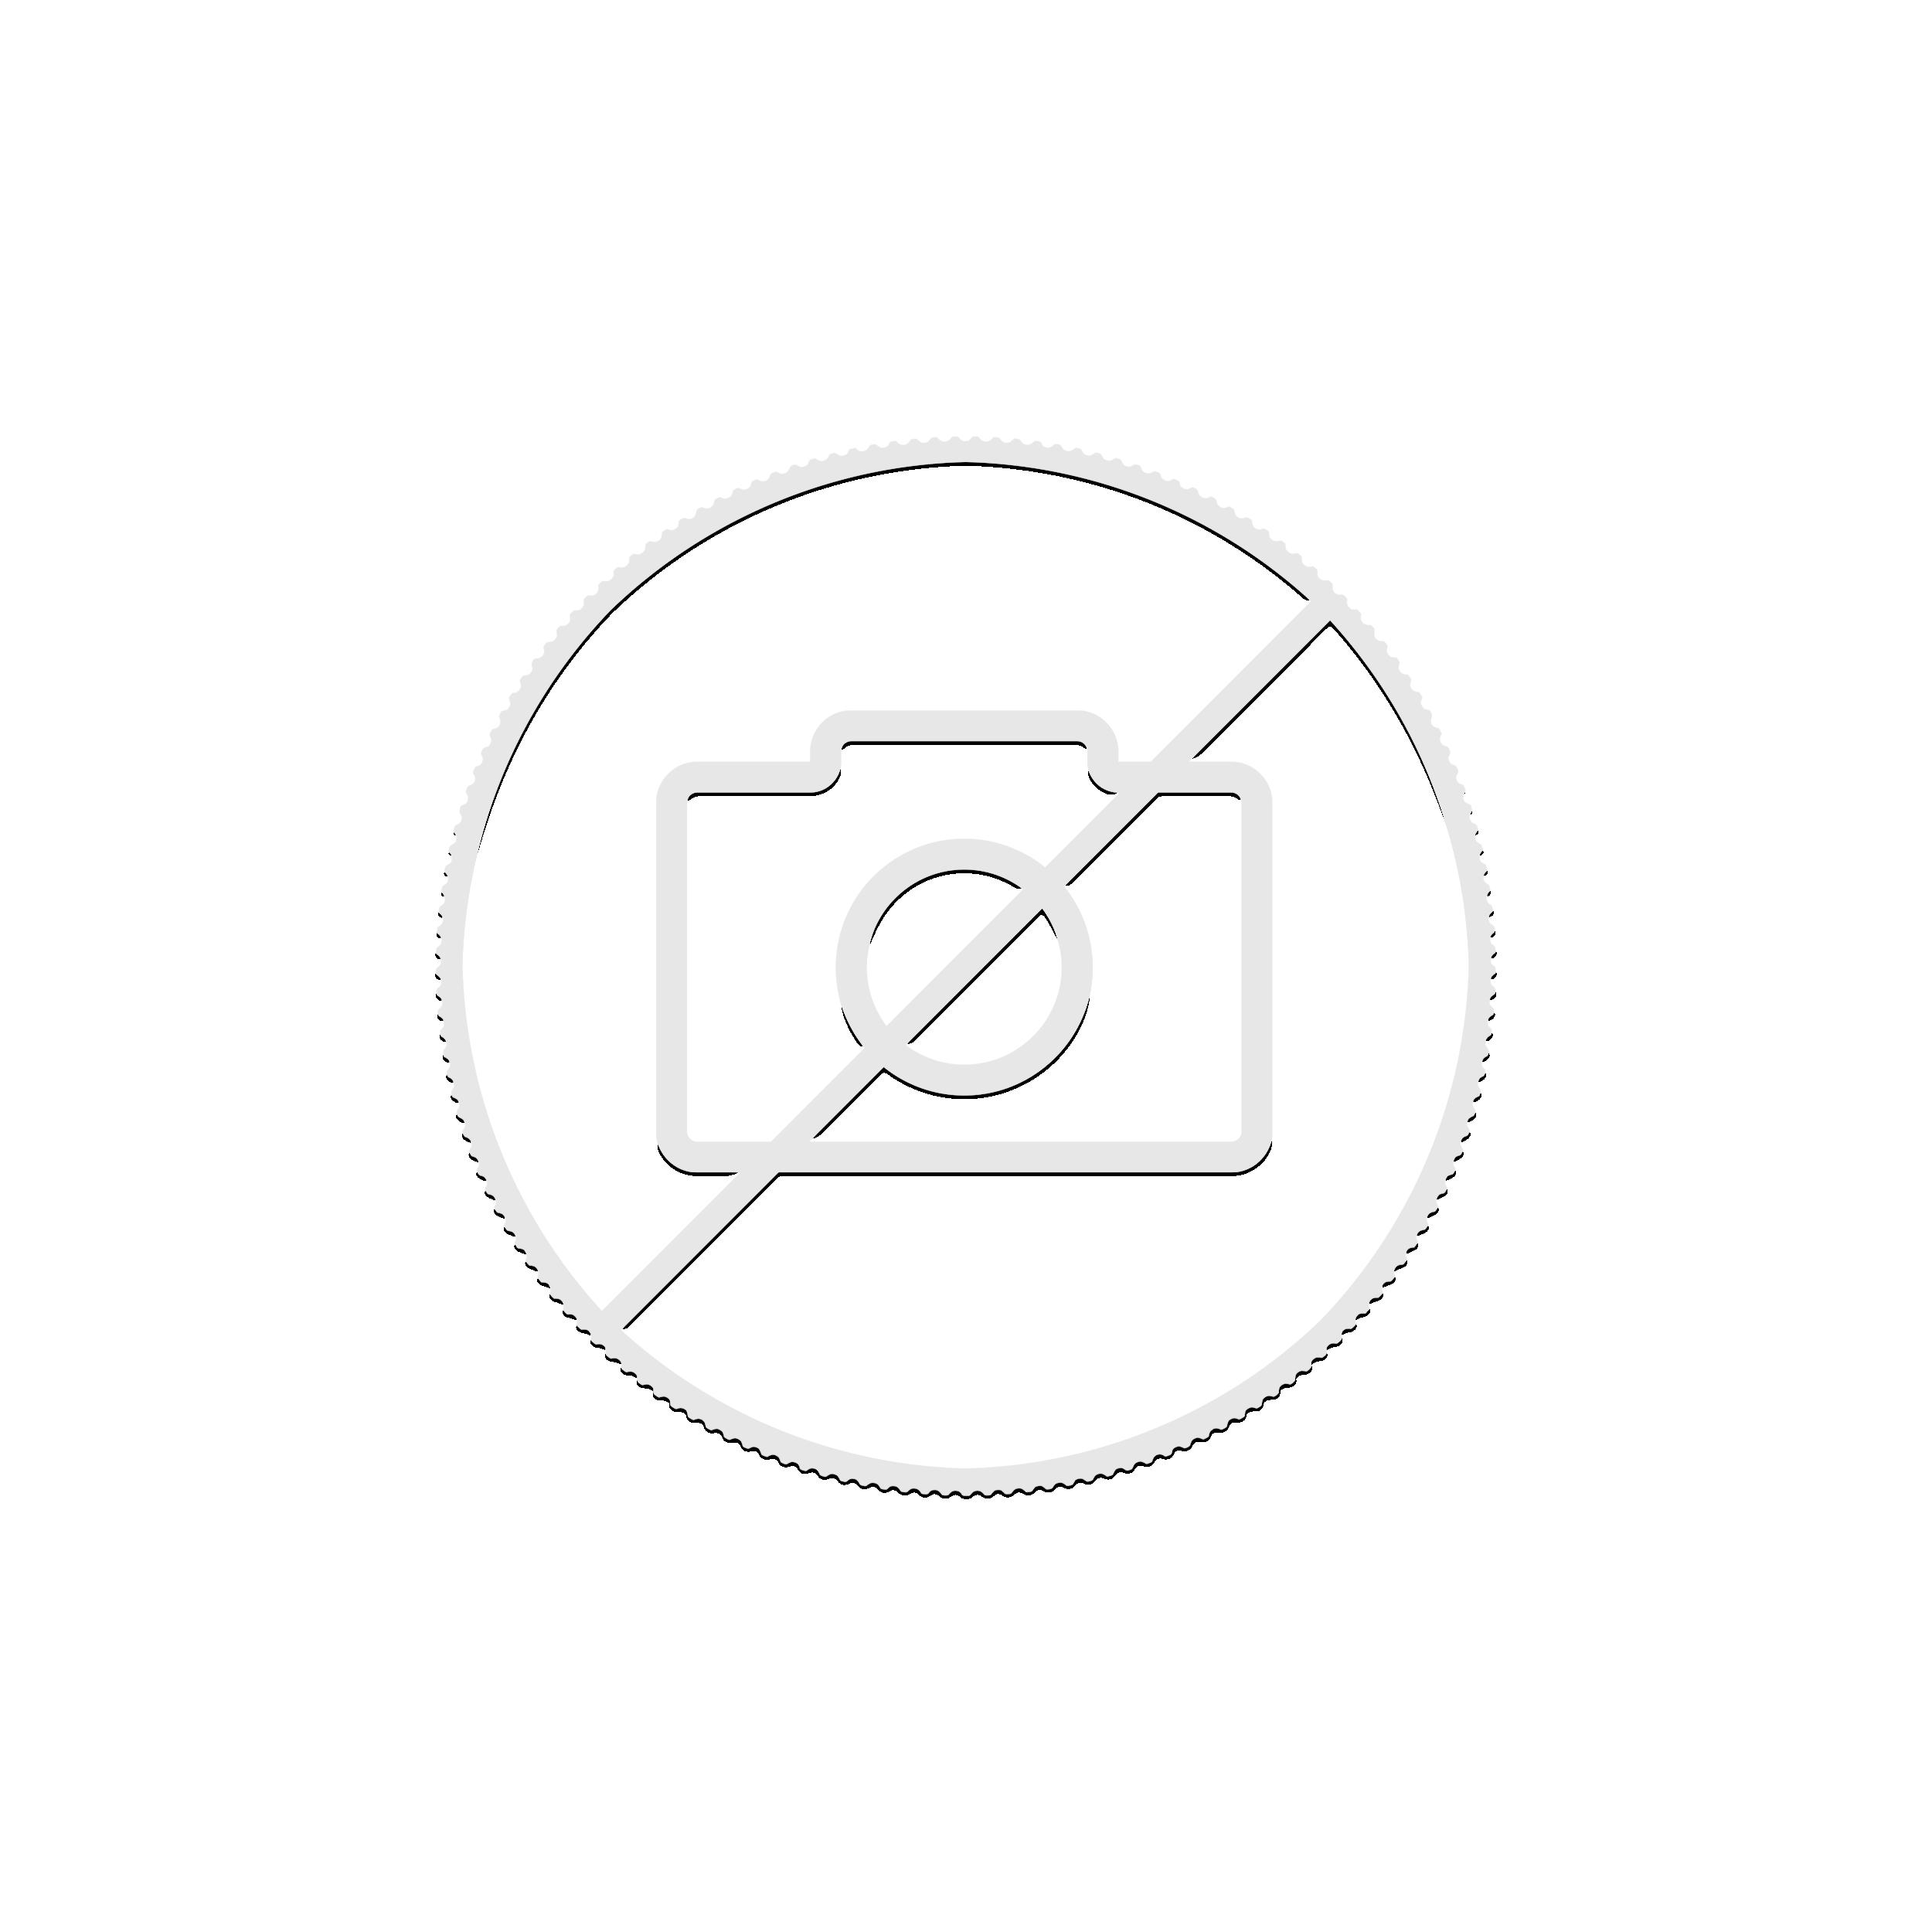 23mm Leuchtturn muntcapsules